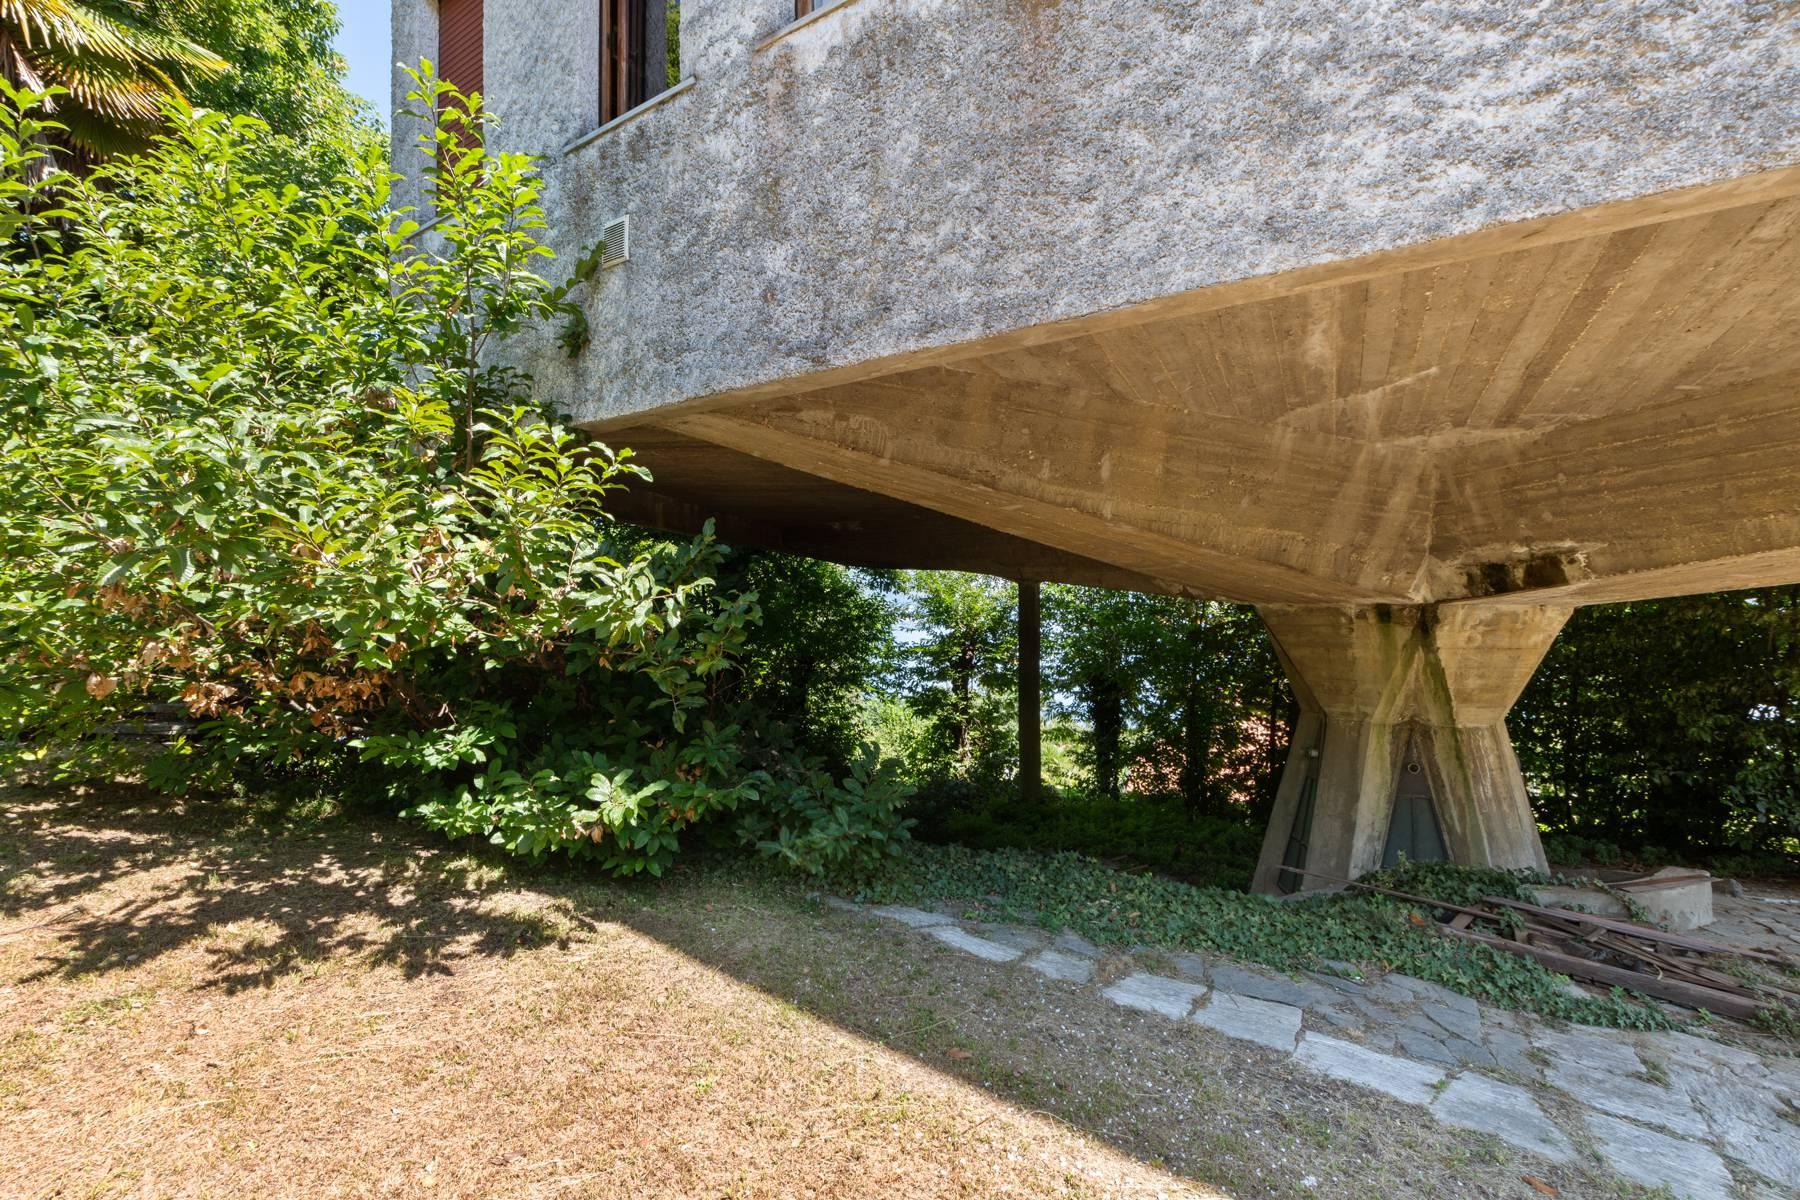 Villa in Vendita a Stresa: 5 locali, 150 mq - Foto 28